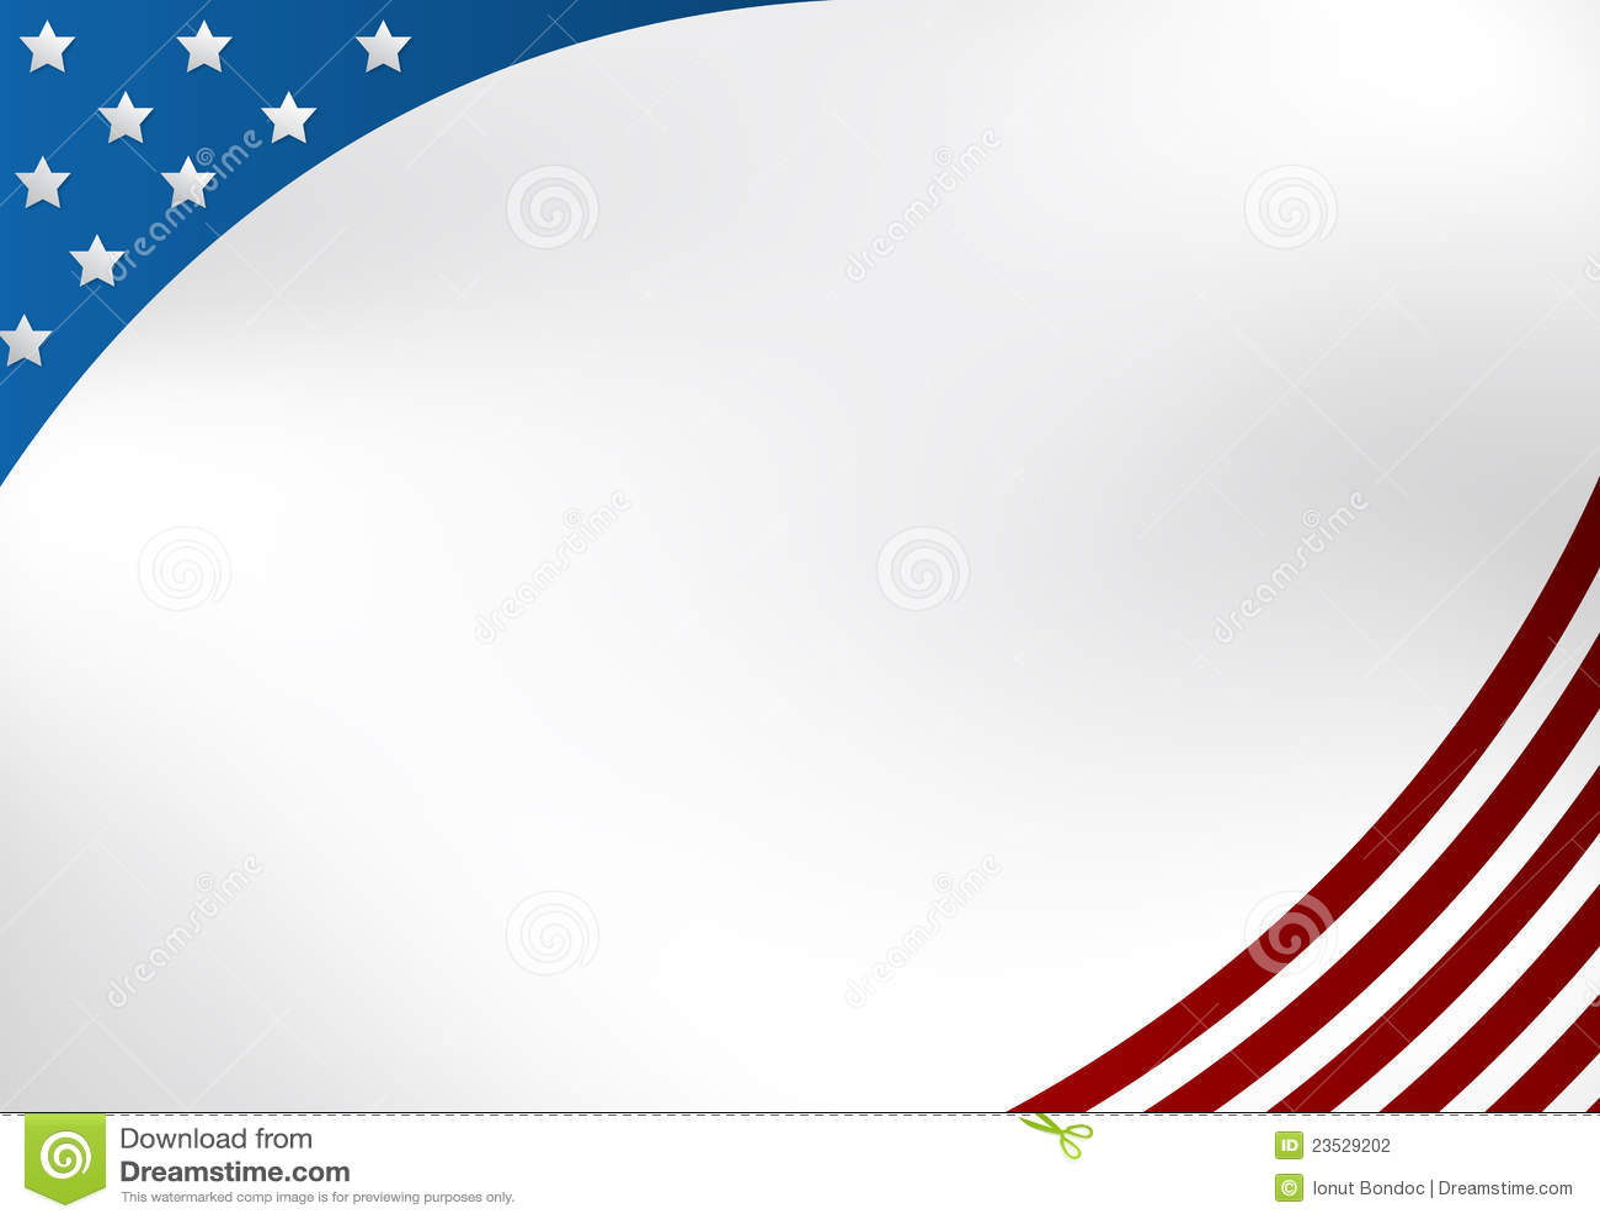 patriotic powerpoint templates